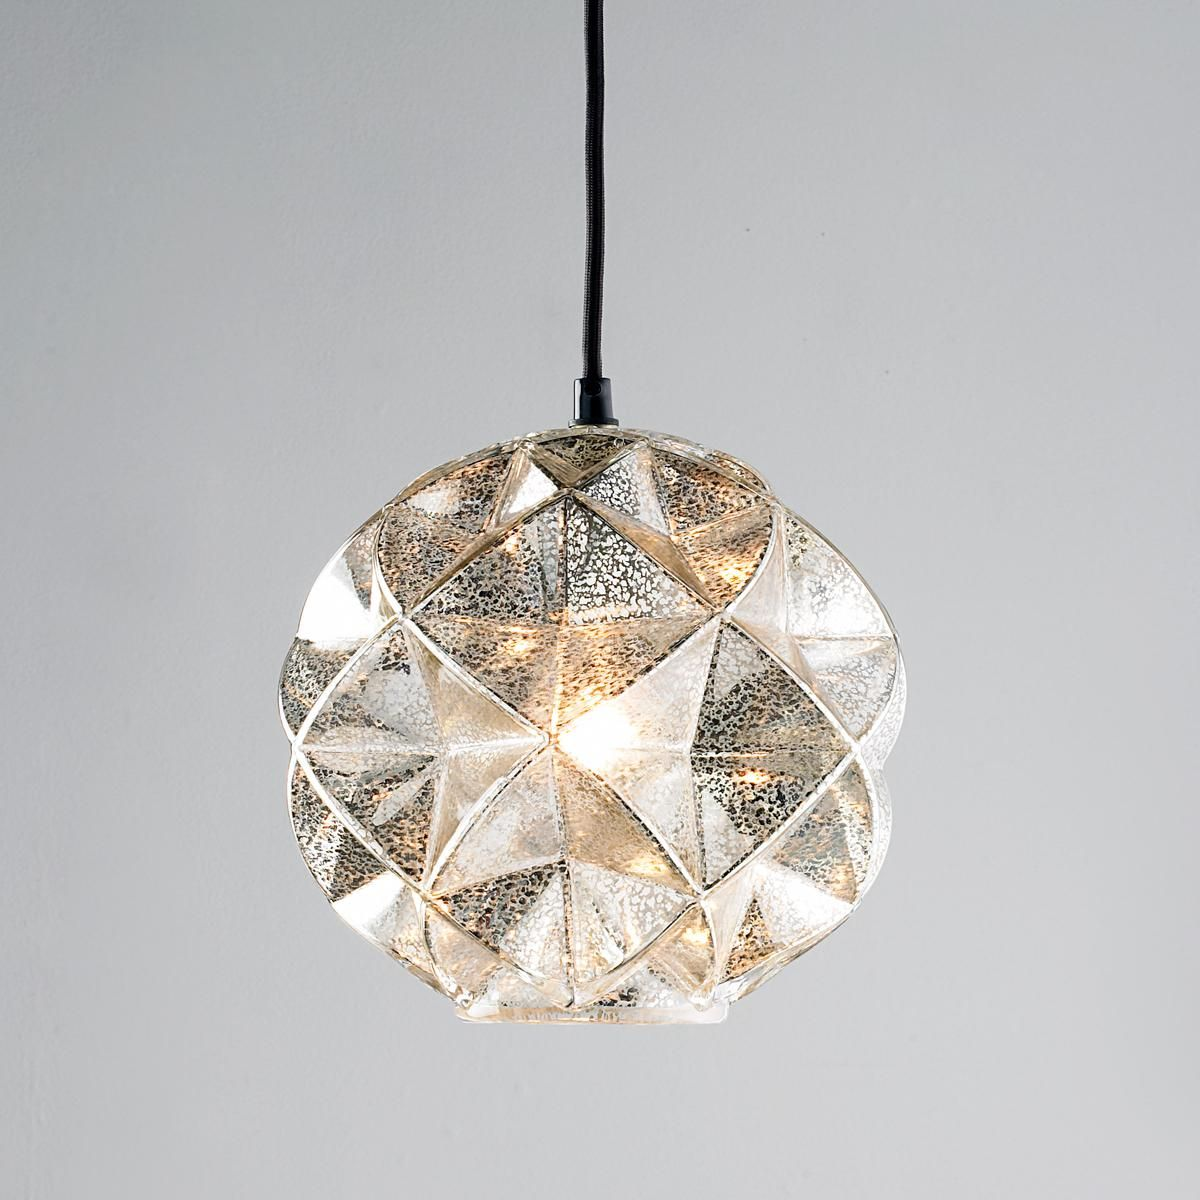 Mercury Glass Geodesic Dome Pendant Dome Pendant Lighting Pendant Light Pendant Light Shades